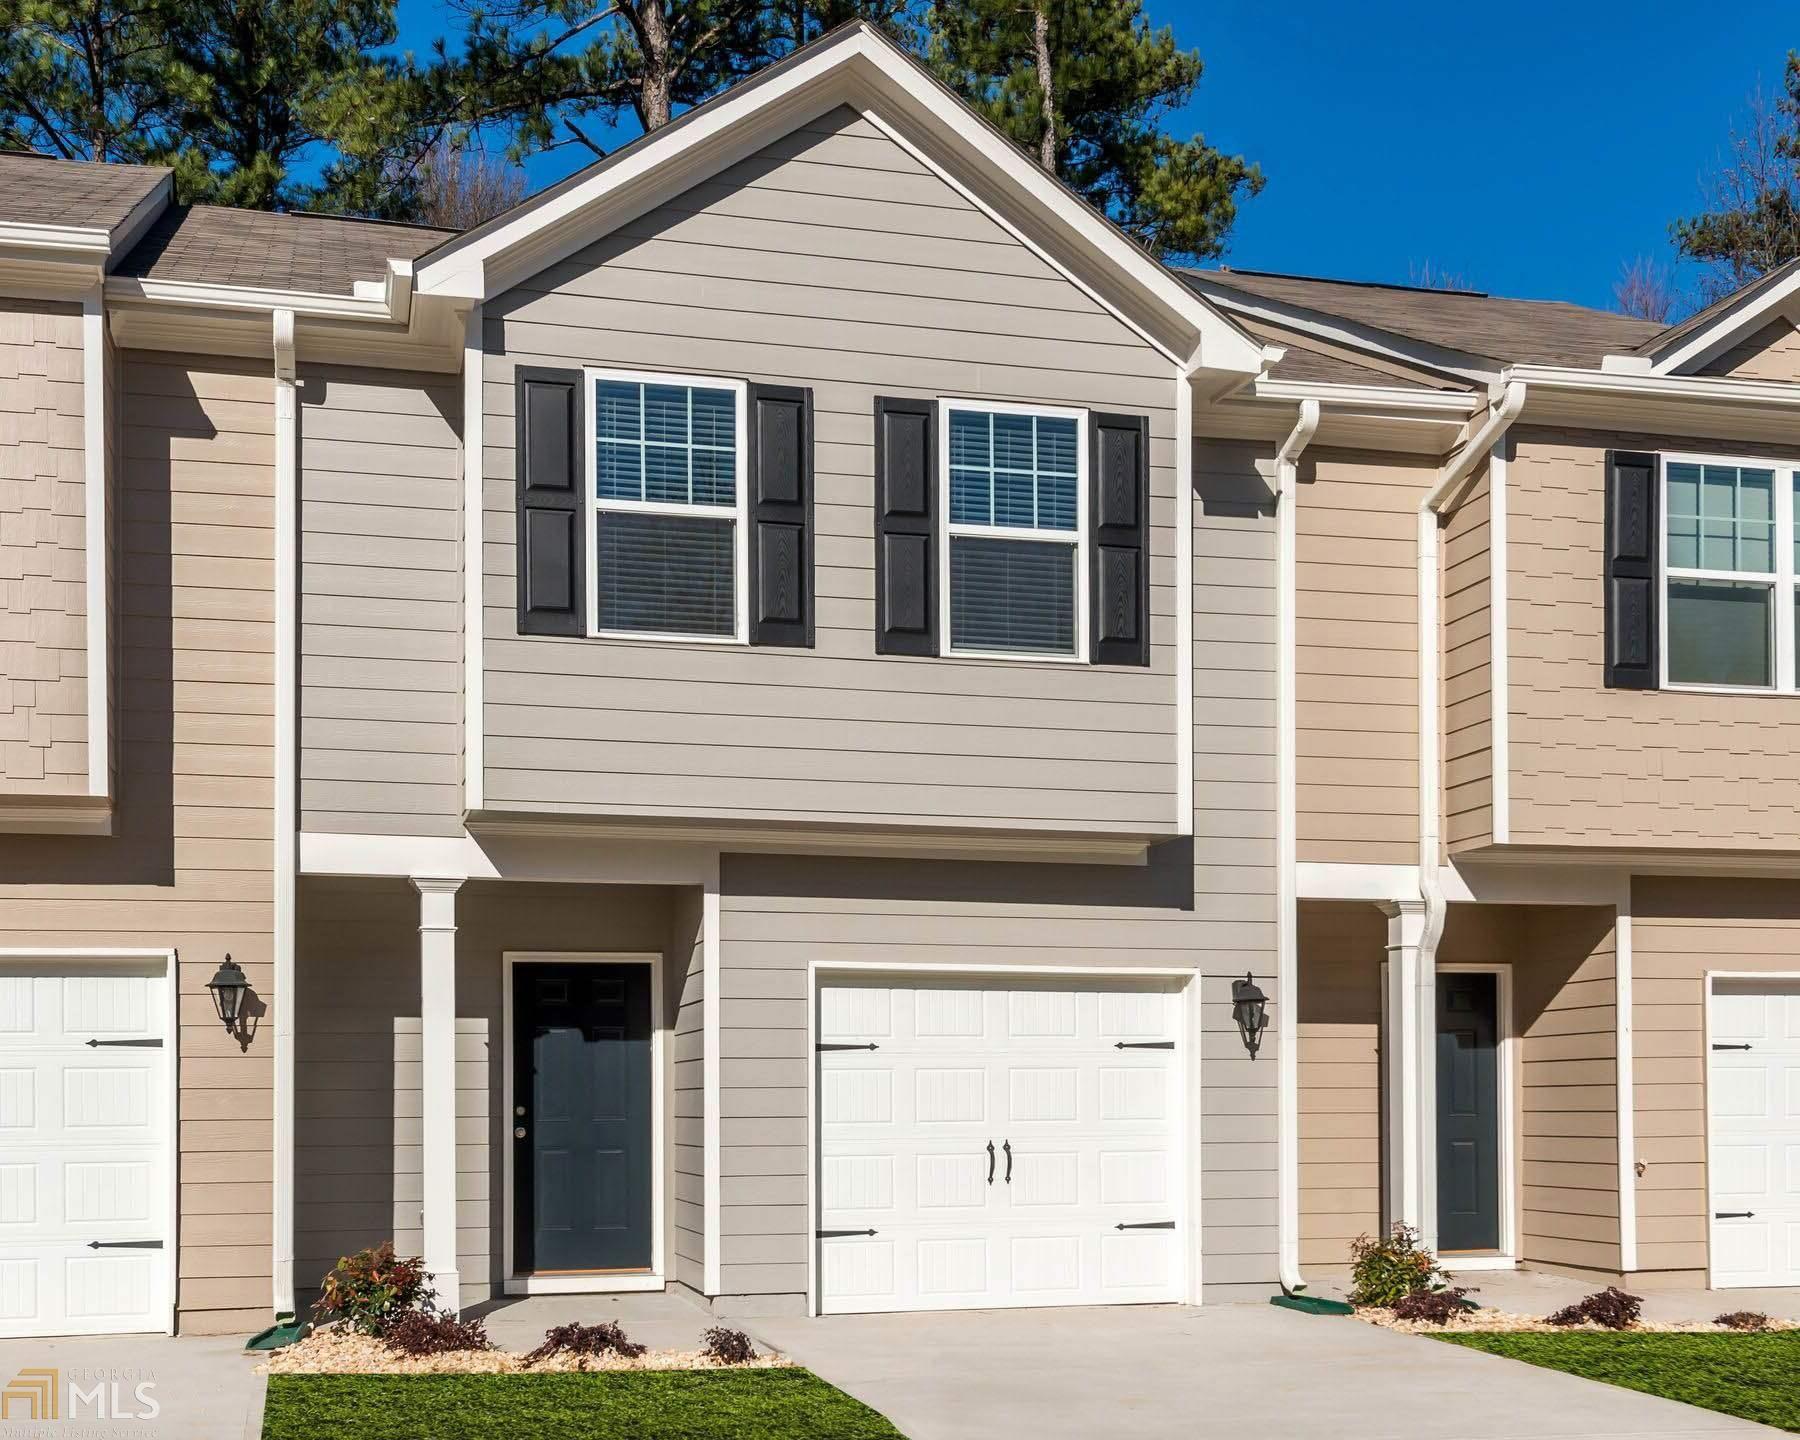 806 Highwood Ln, East Point, GA 30344 - MLS#: 8866547